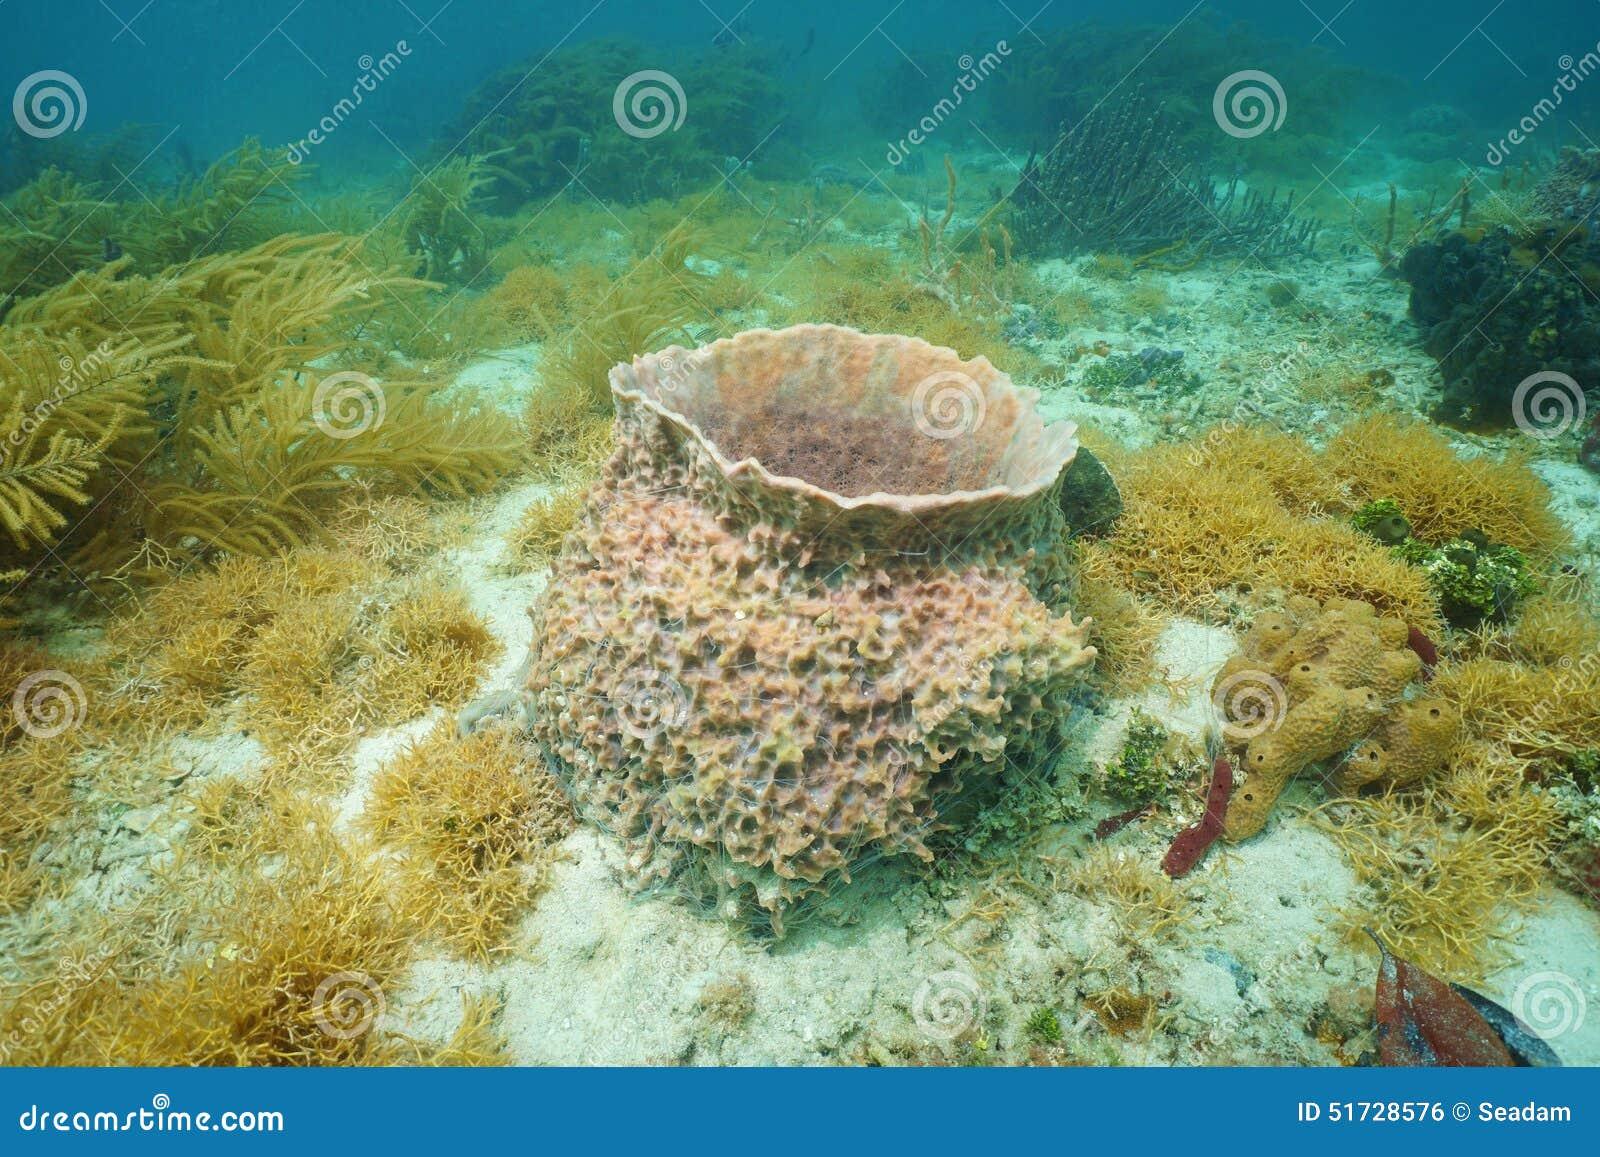 Caribbean Sea Creatures: Underwater Creature Giant Barrel Sponge Stock Photo